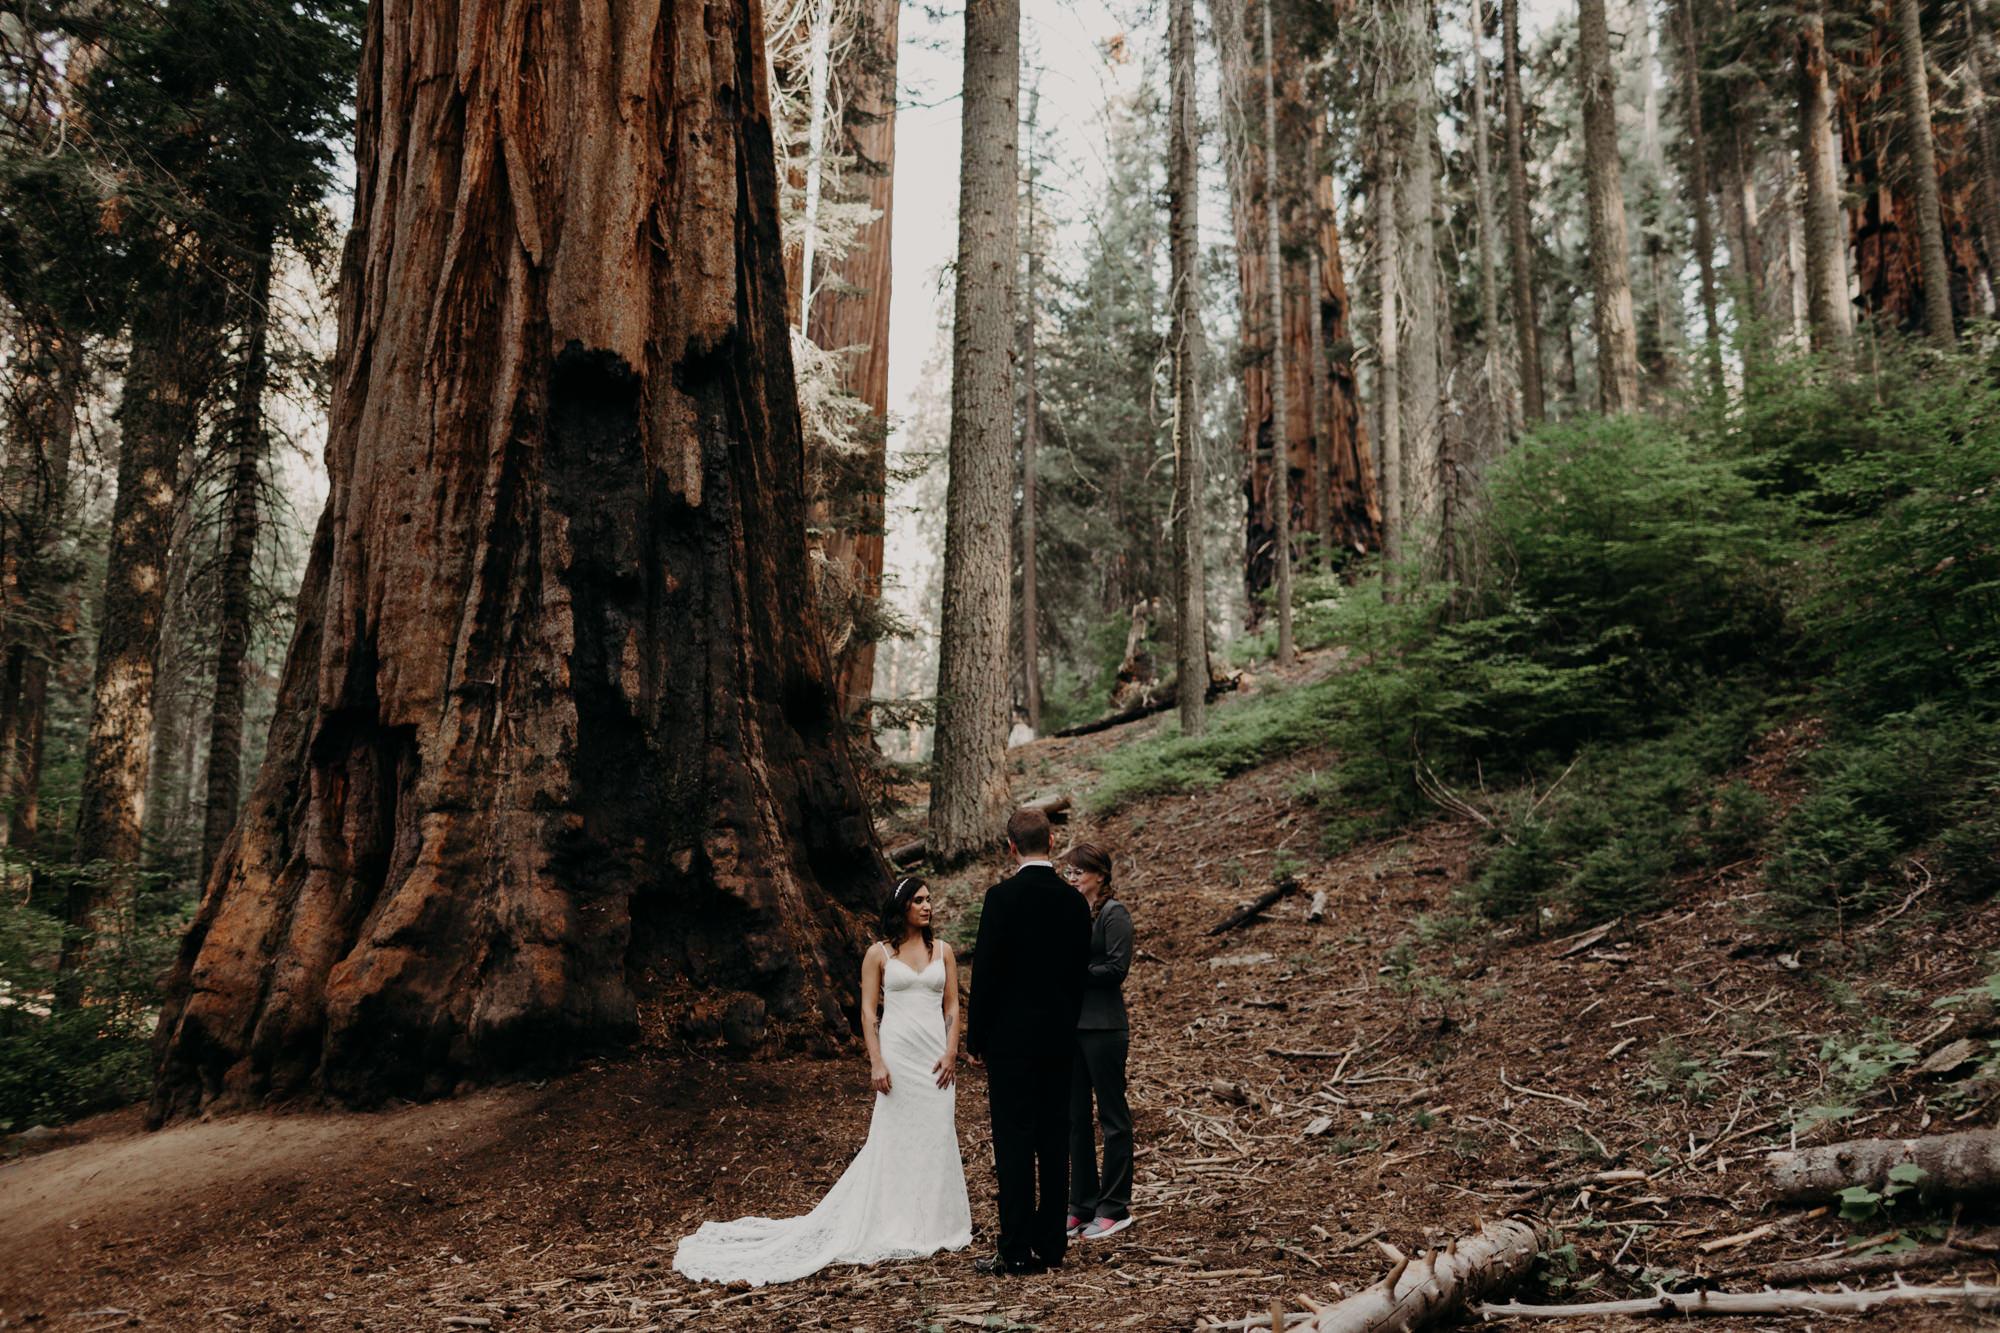 sequoia national park elopement-2.jpg